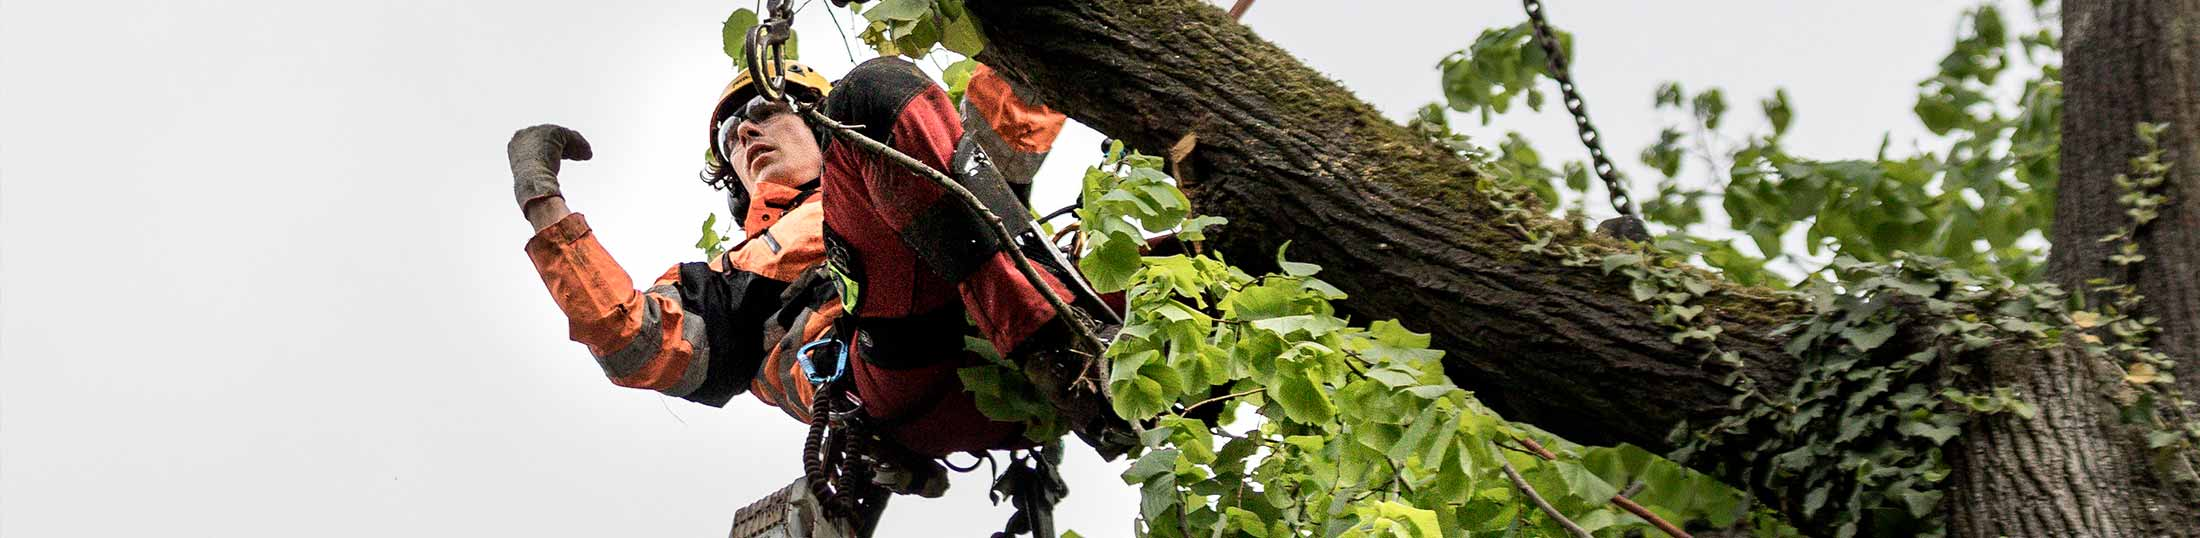 Nürnberger Baumpflege GbmH in Ihrer Nähe